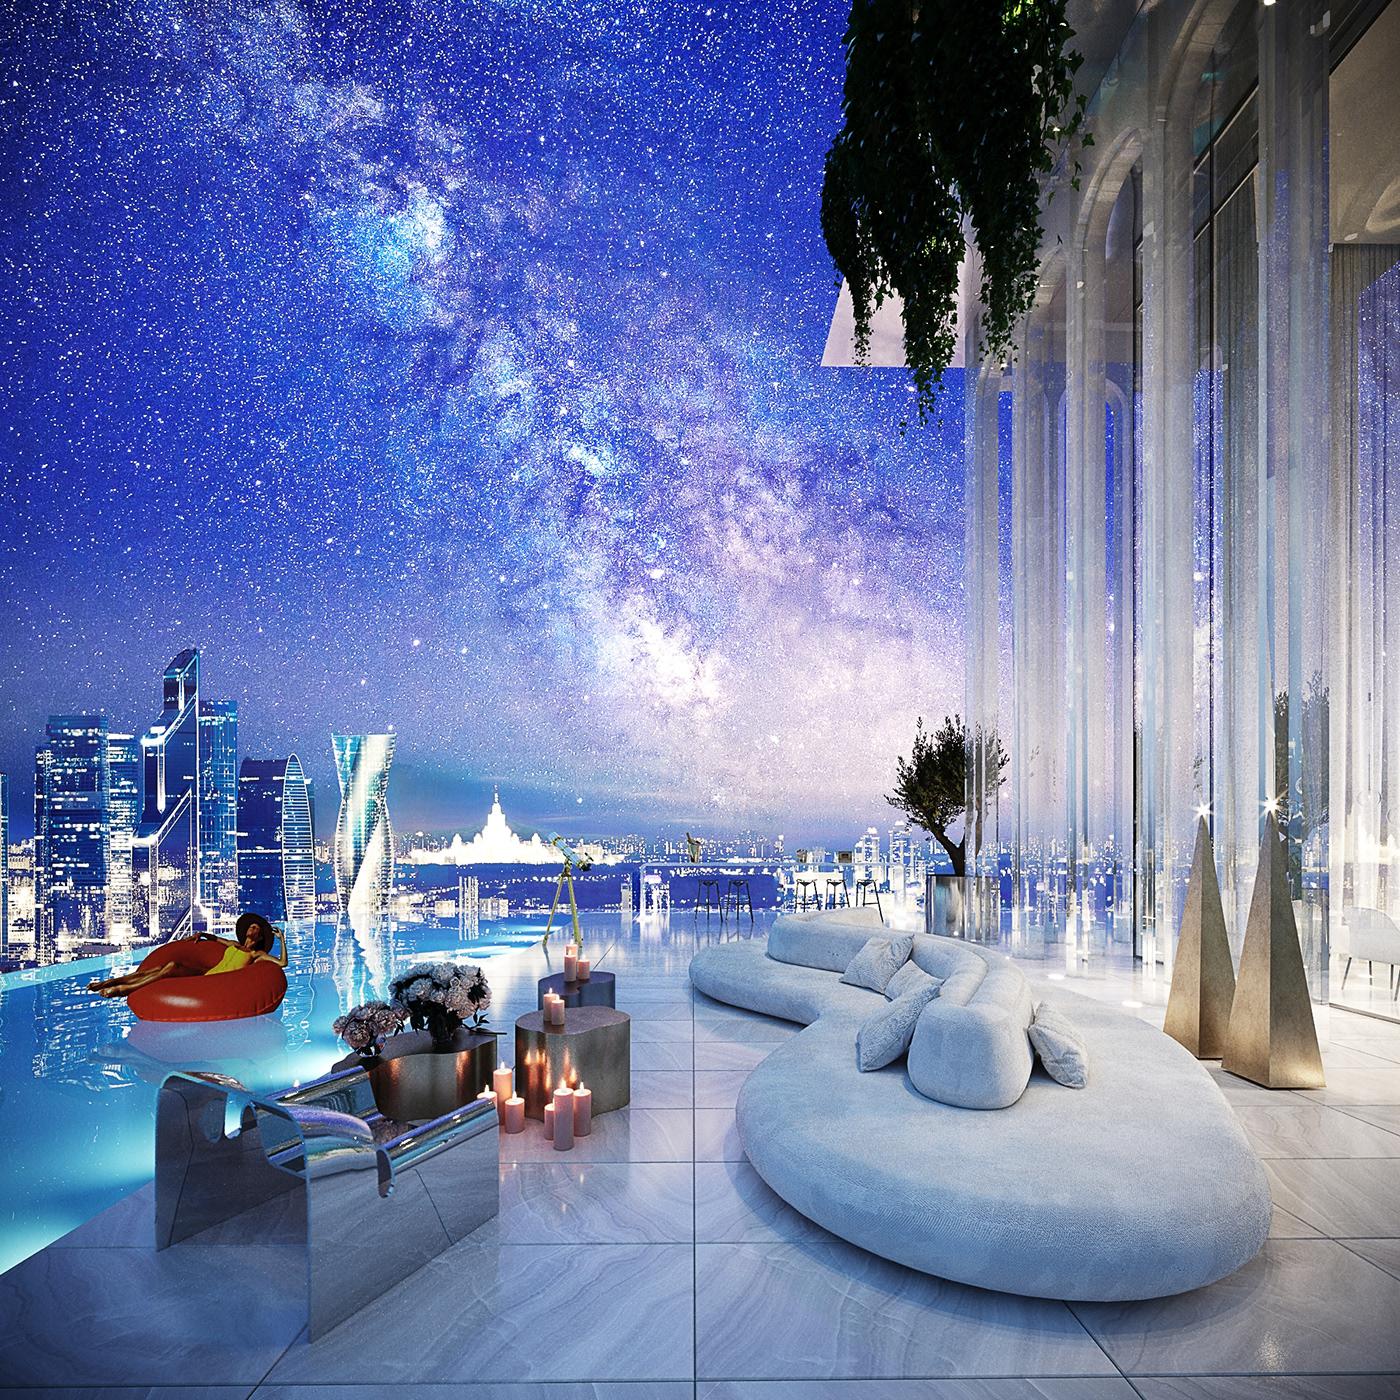 architect architecture coronarenderer design Interior interiordesign Swimmingpool